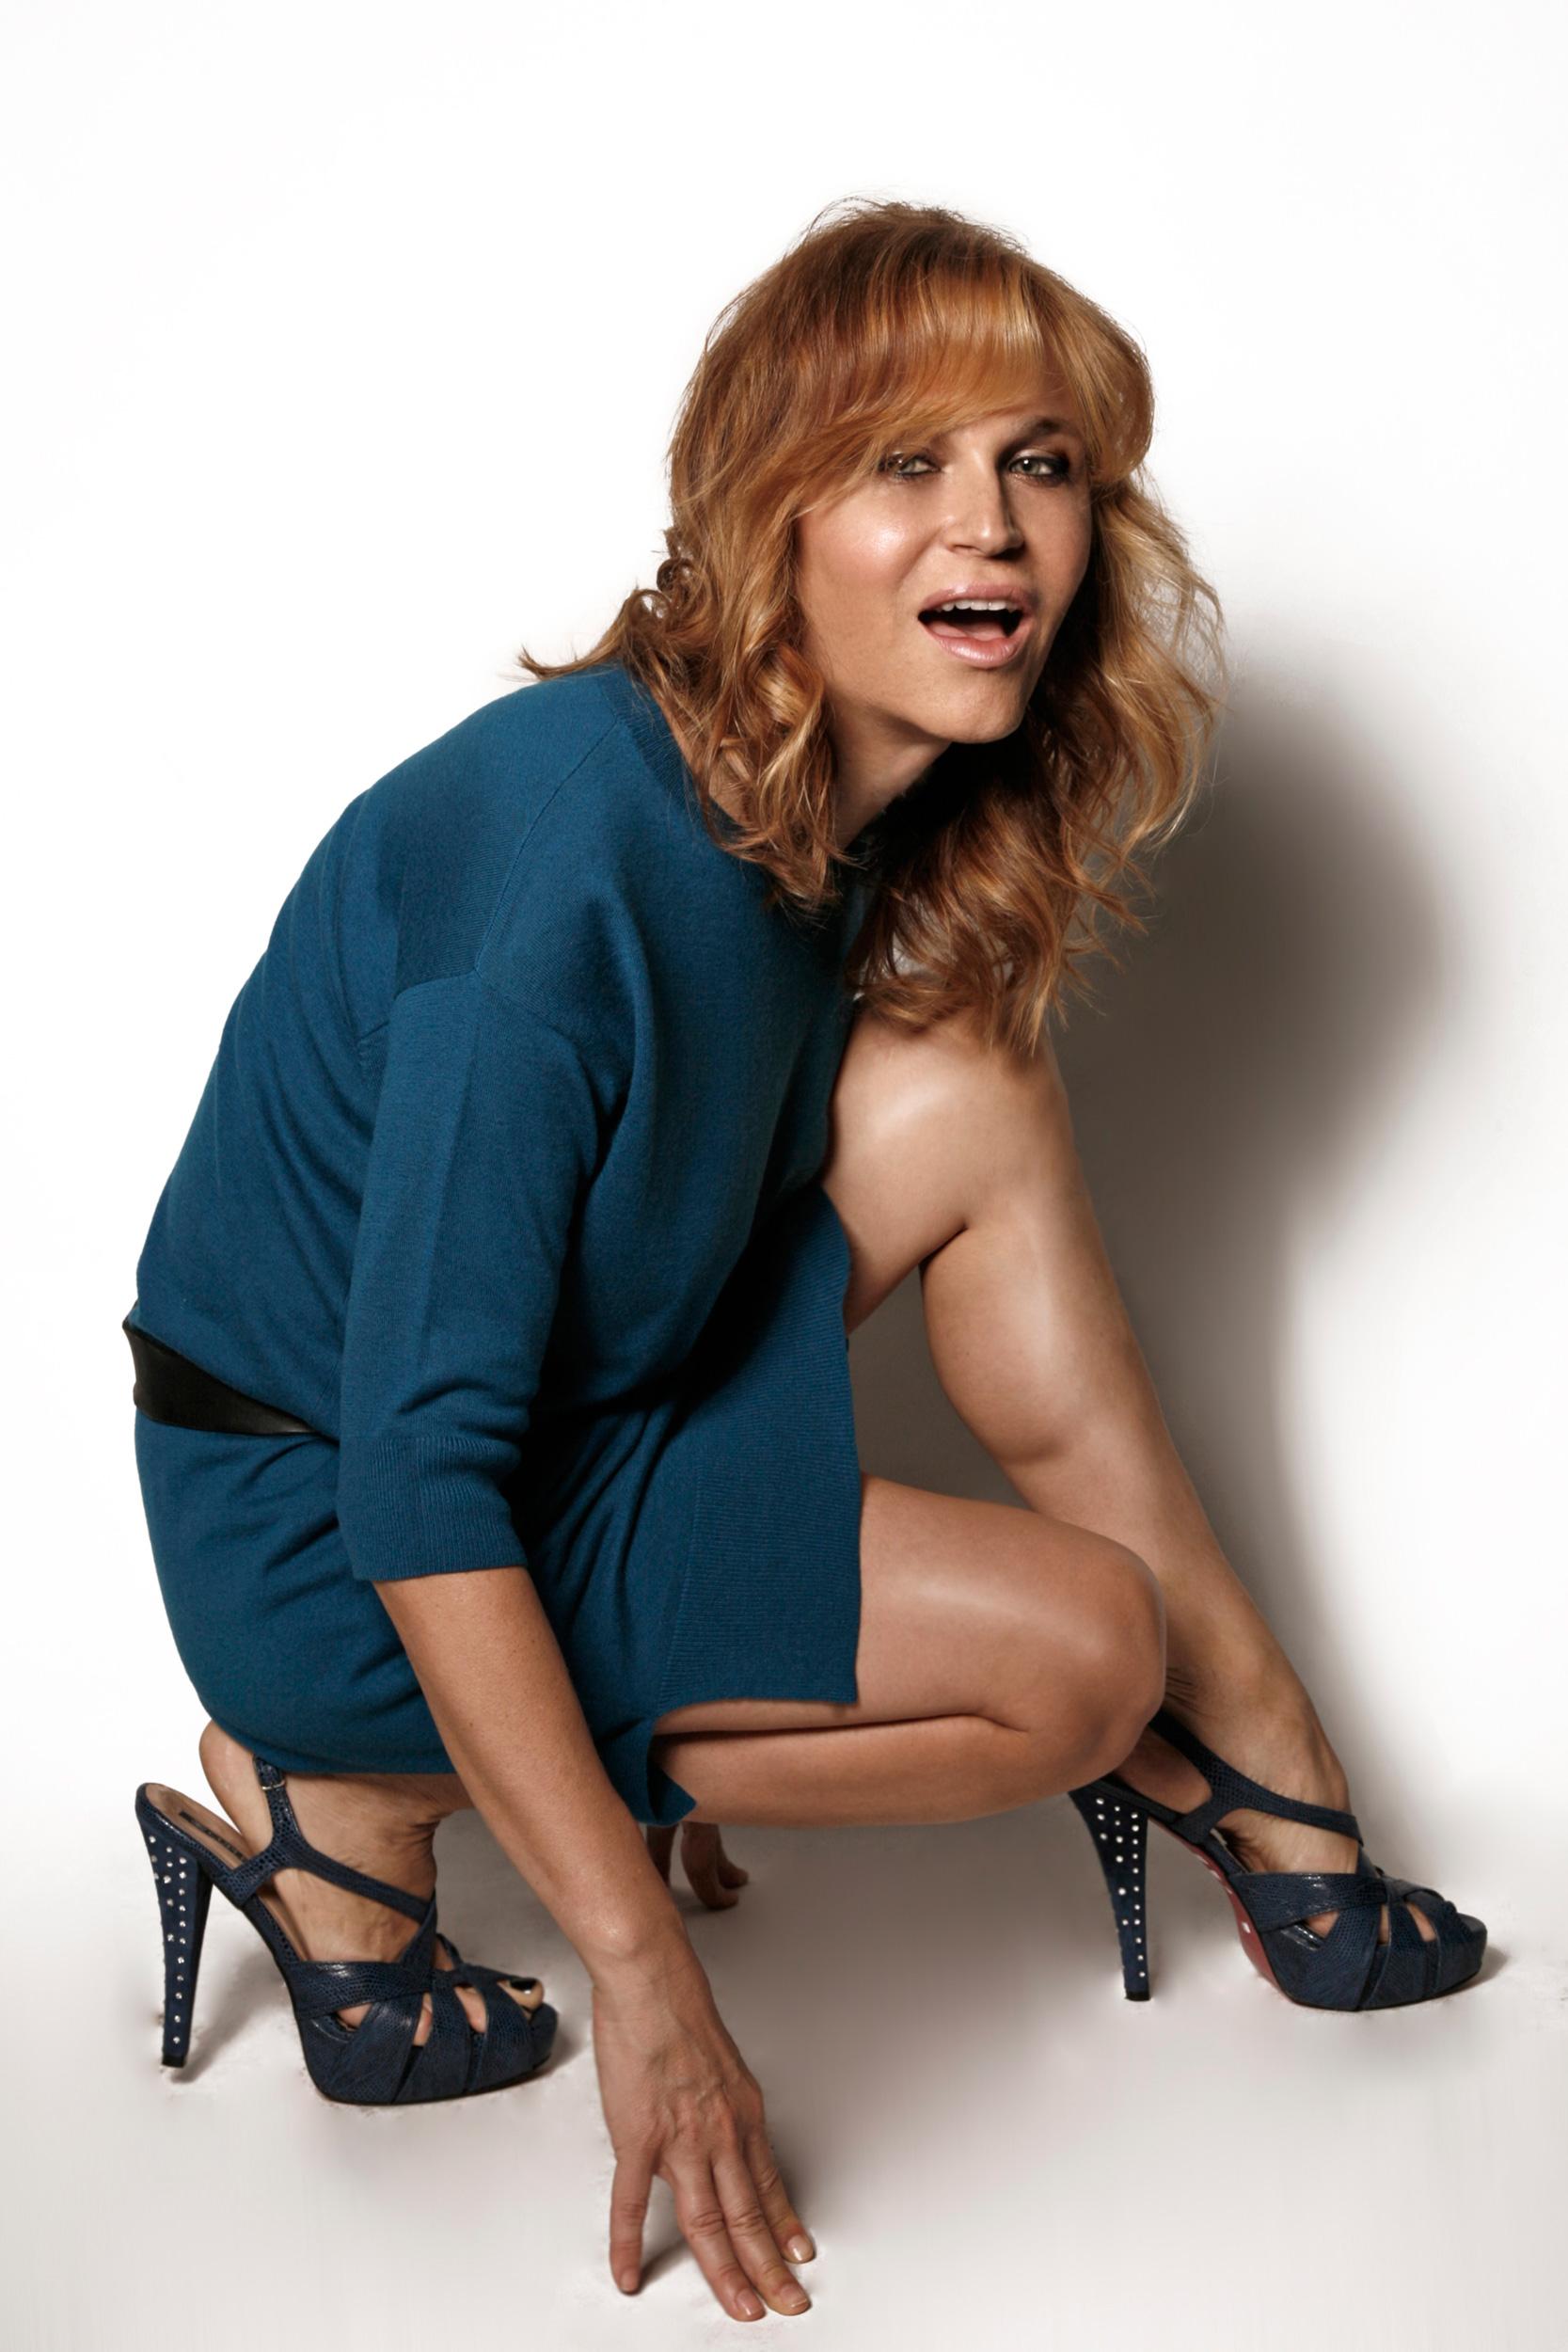 Antonia San Juan's Feet